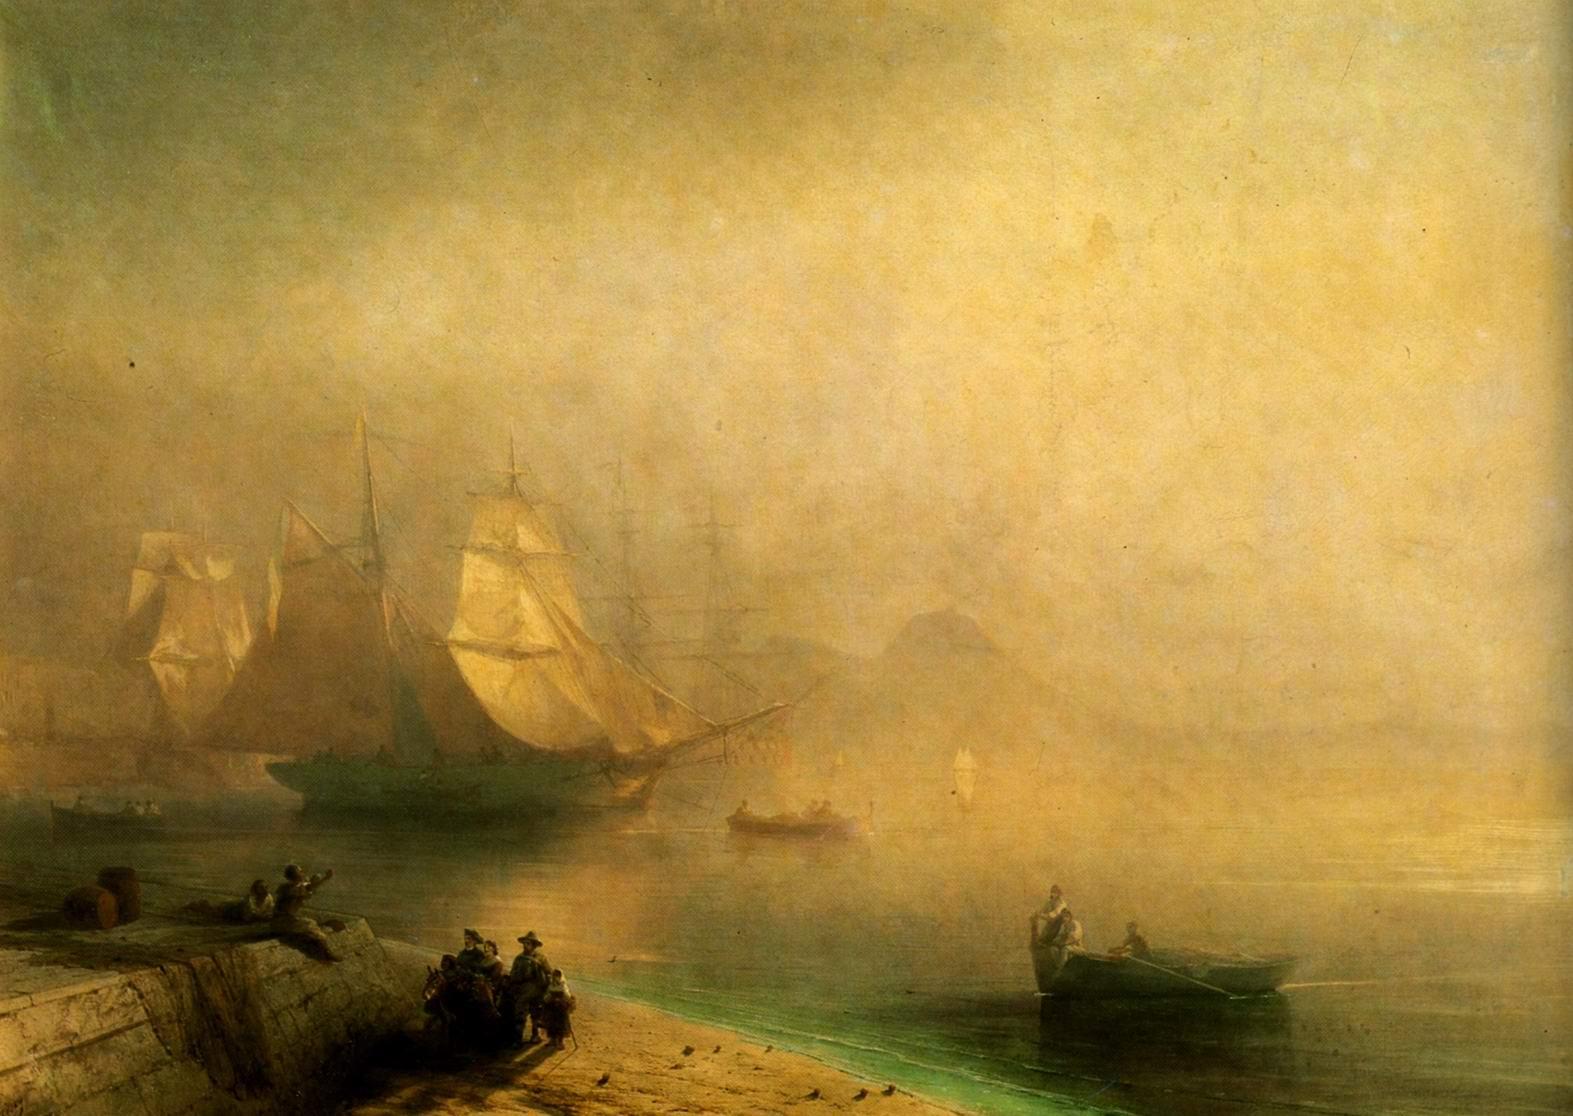 Неаполитанский залив в туманное утро, Айвазовский Иван Константинович